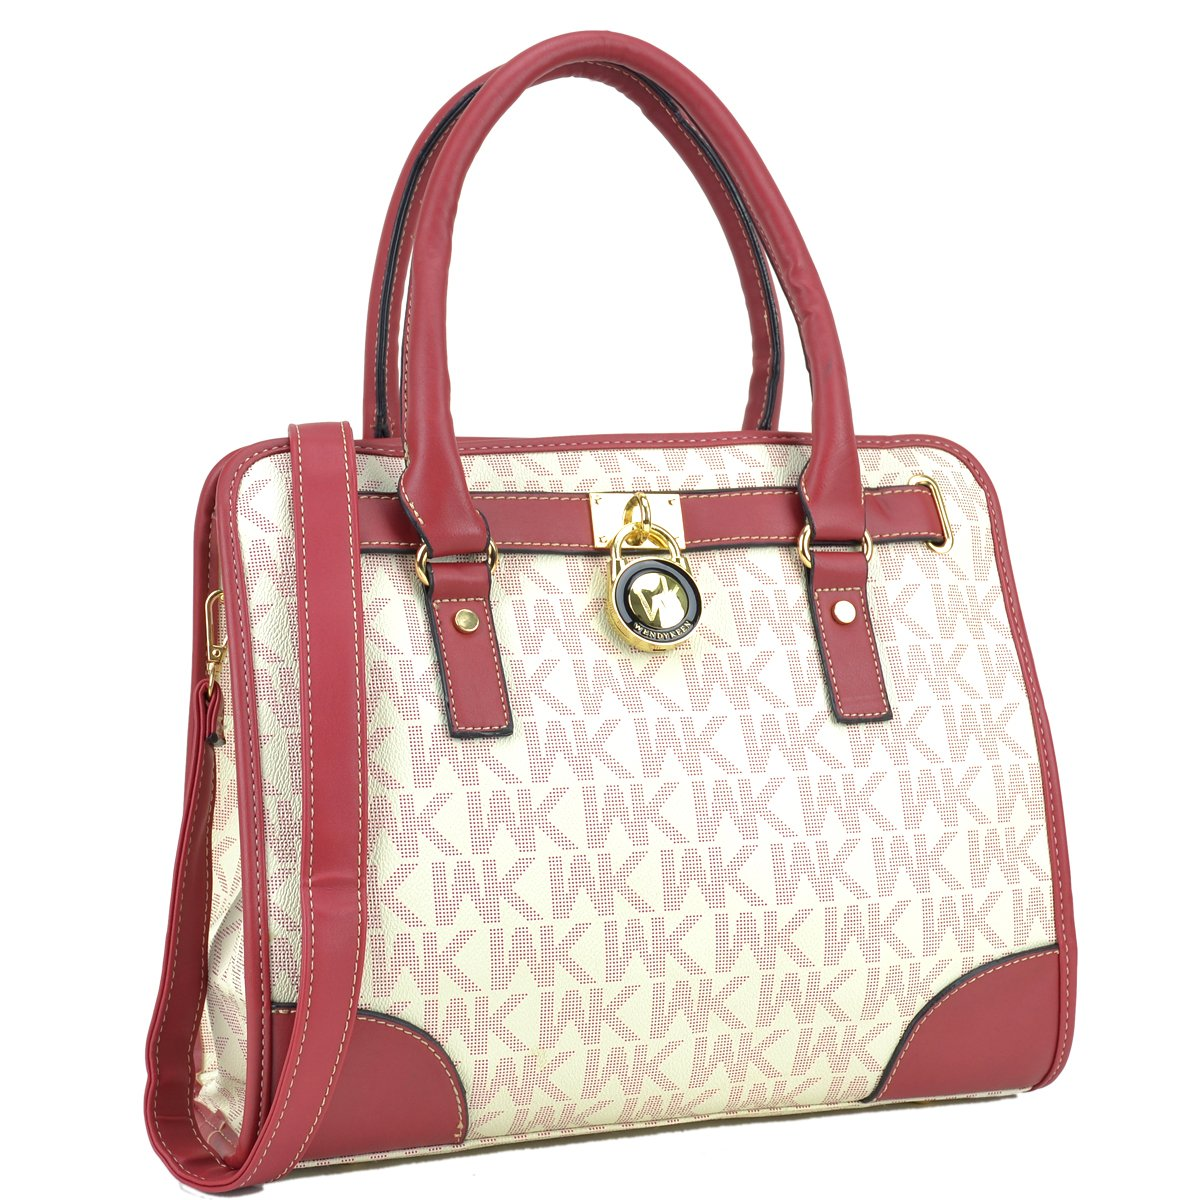 Medium Satchel Purse Designer Handbag Top Handle Shoulder Bag Padlock Red/White